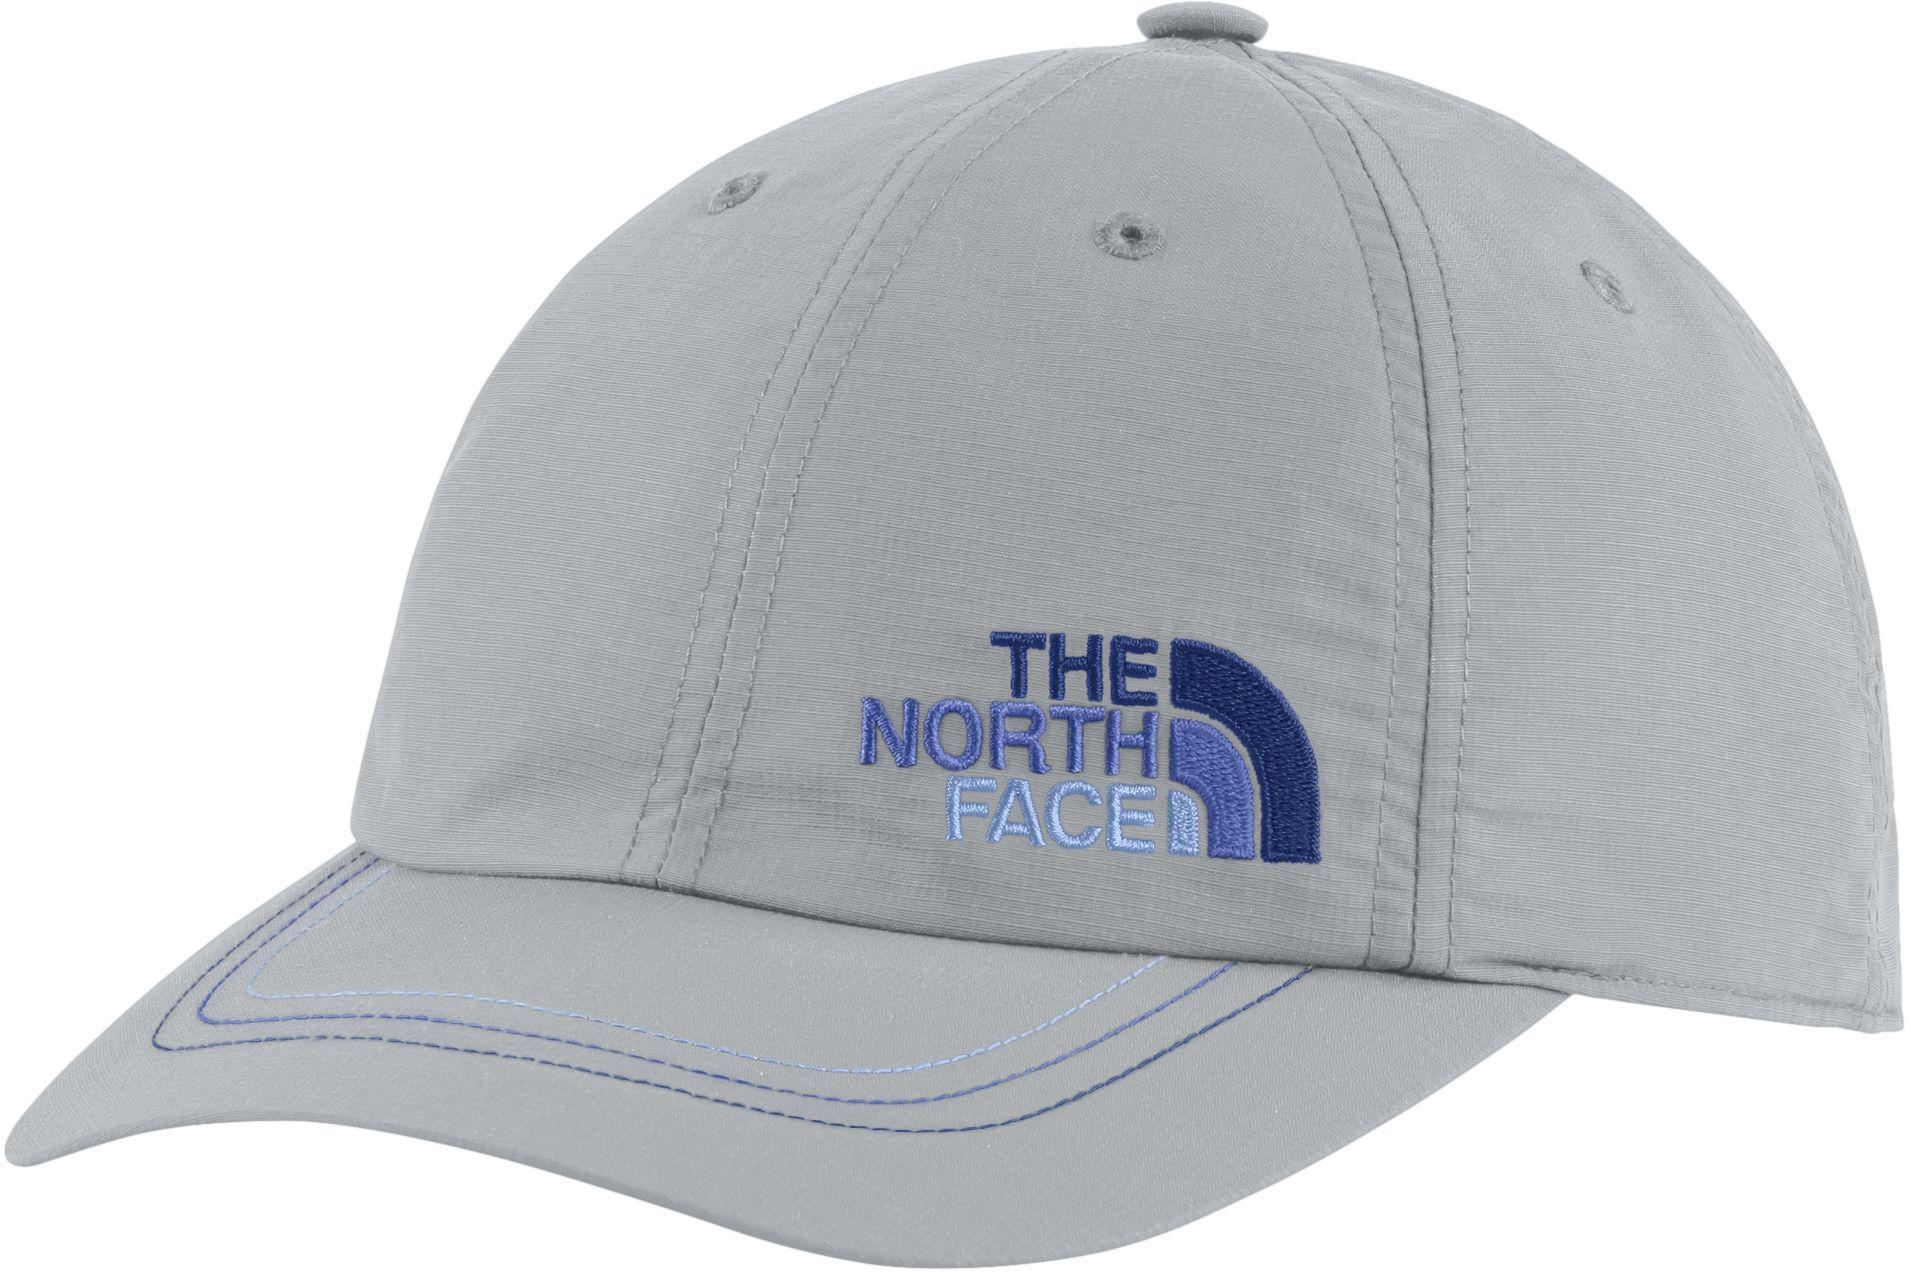 068b93fbc1b Lyst - The North Face Horizon Ball Cap in Gray